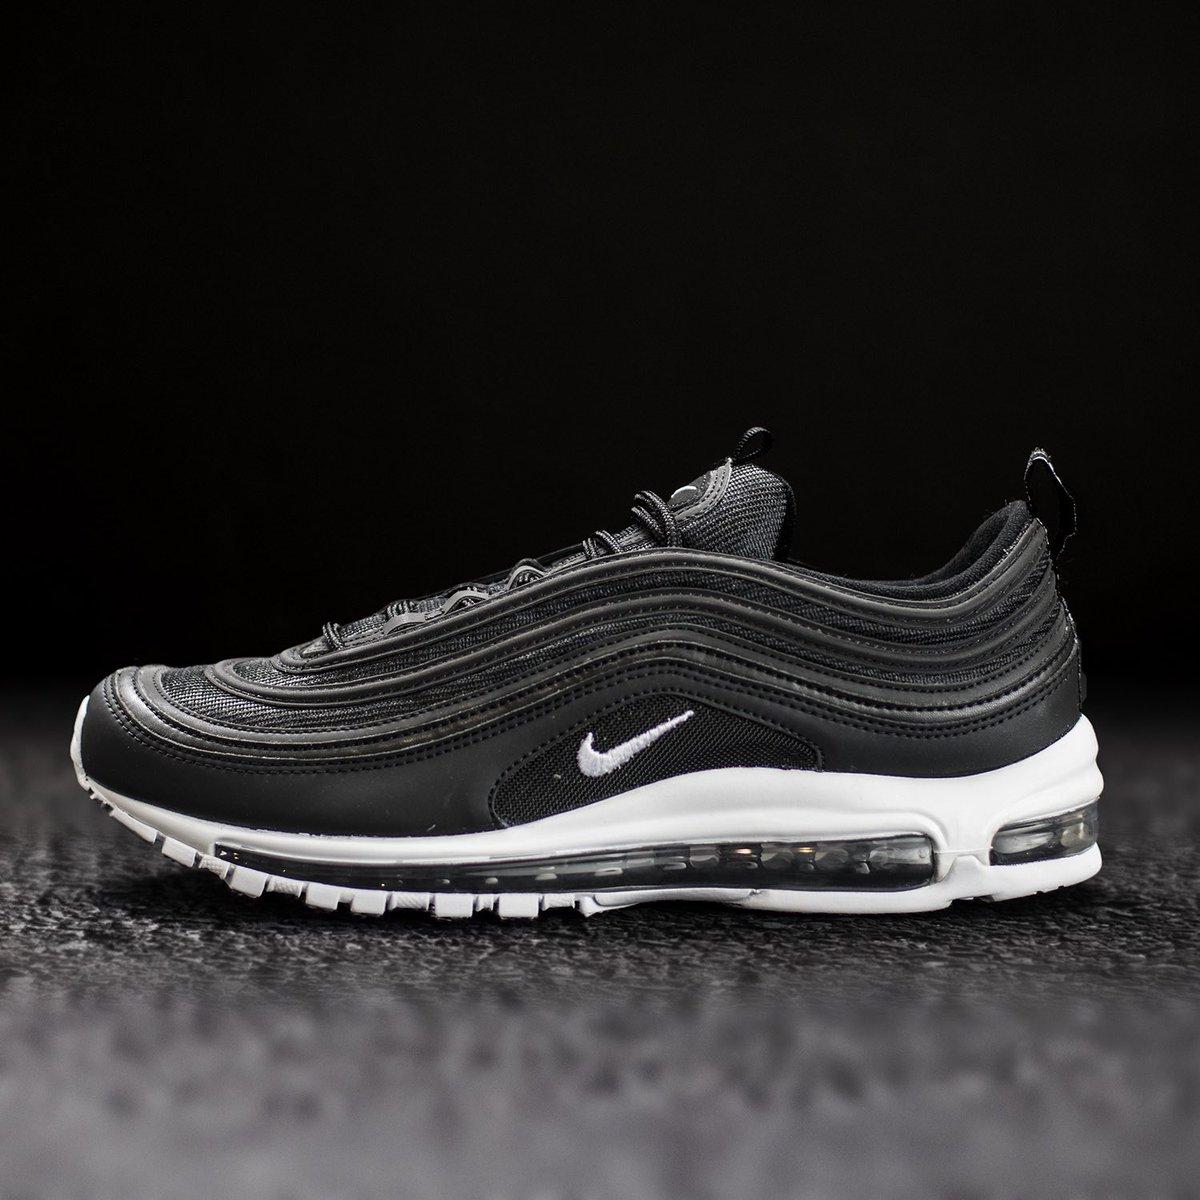 Available: Nike Air Max 97 OG \